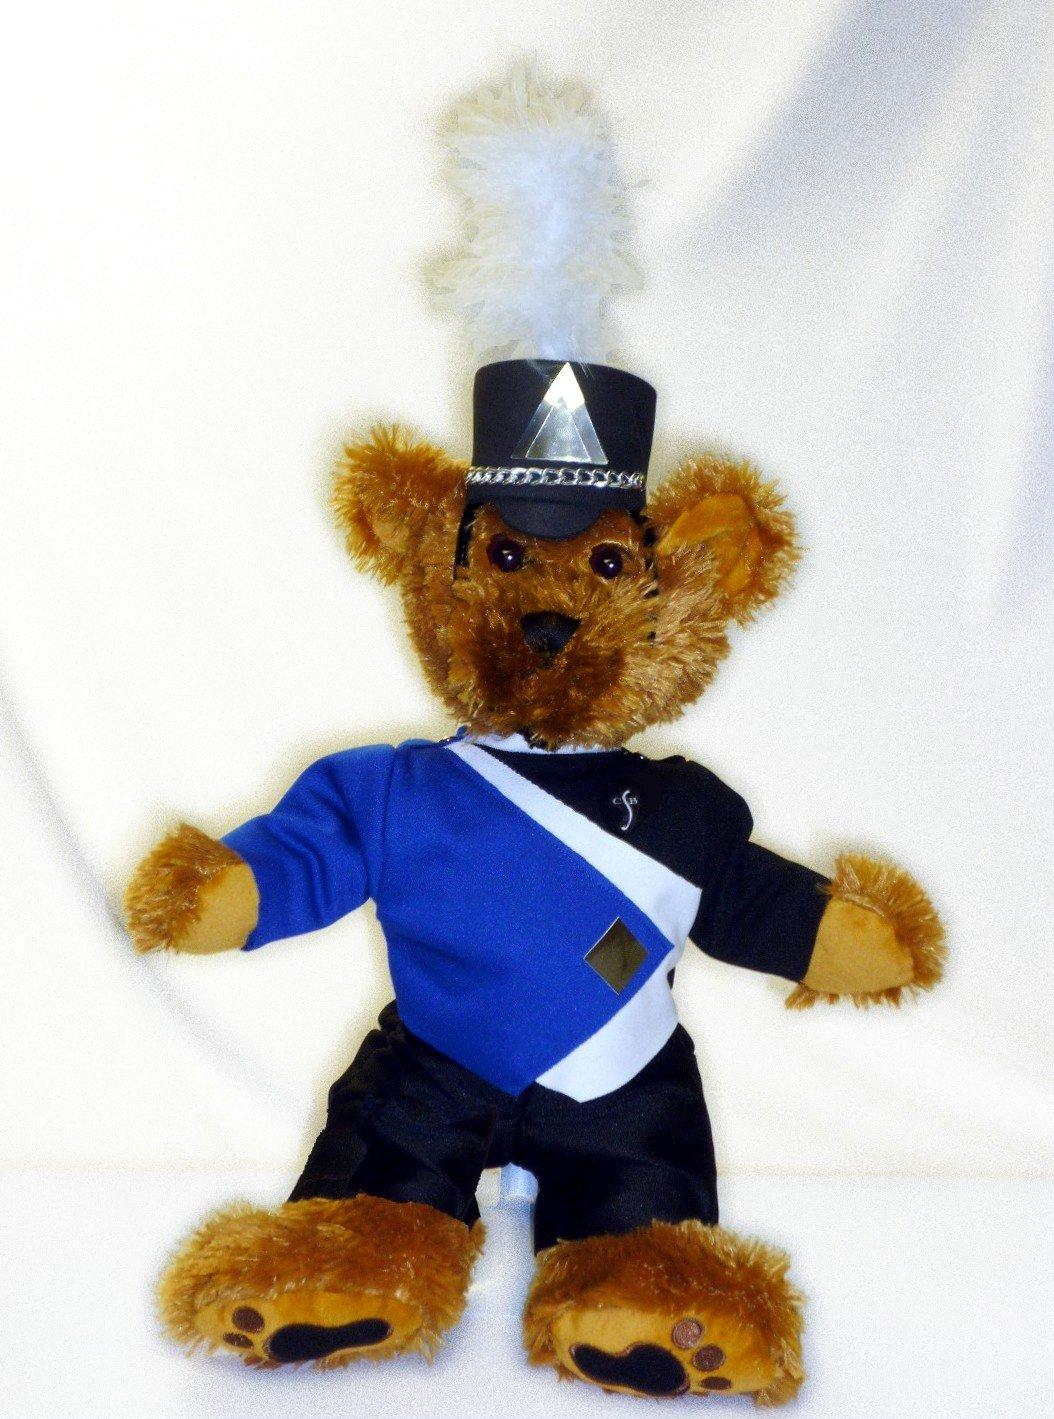 Central Bucks SOUTH HS Marching Band Uniform Teddy Bear